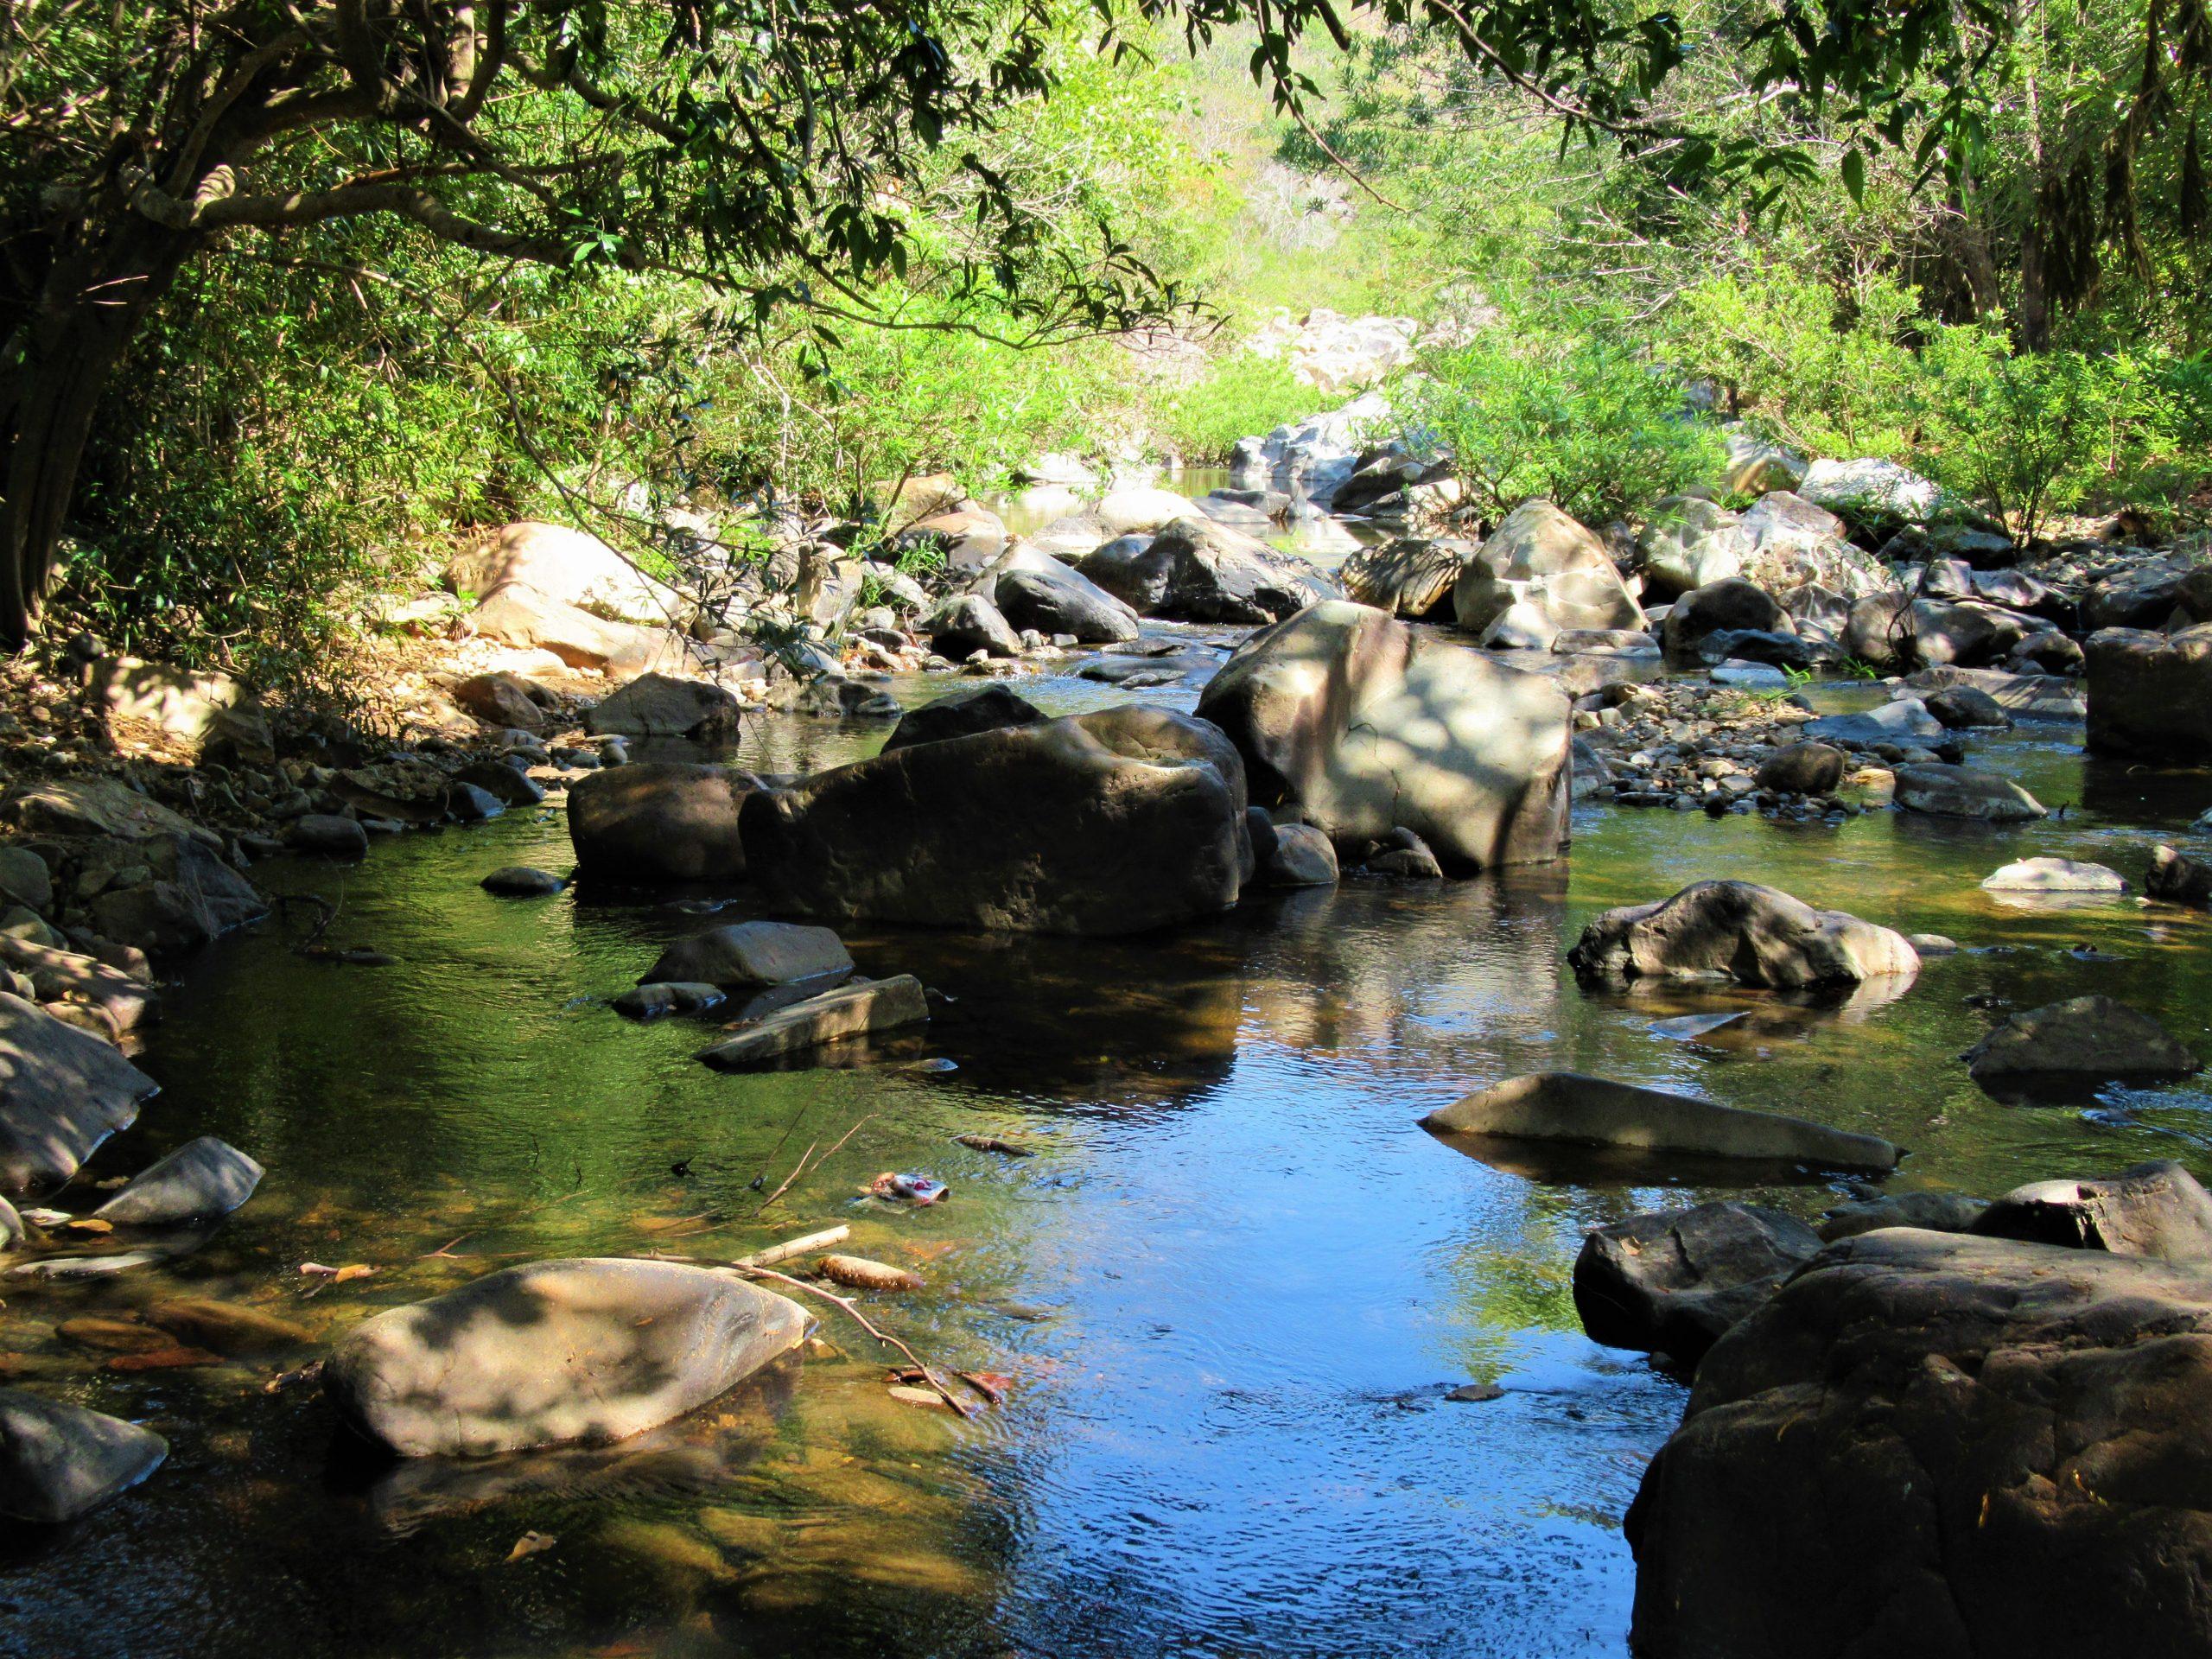 Camping on the Cho Mo River, Ninh Thuan Province, Vietnam